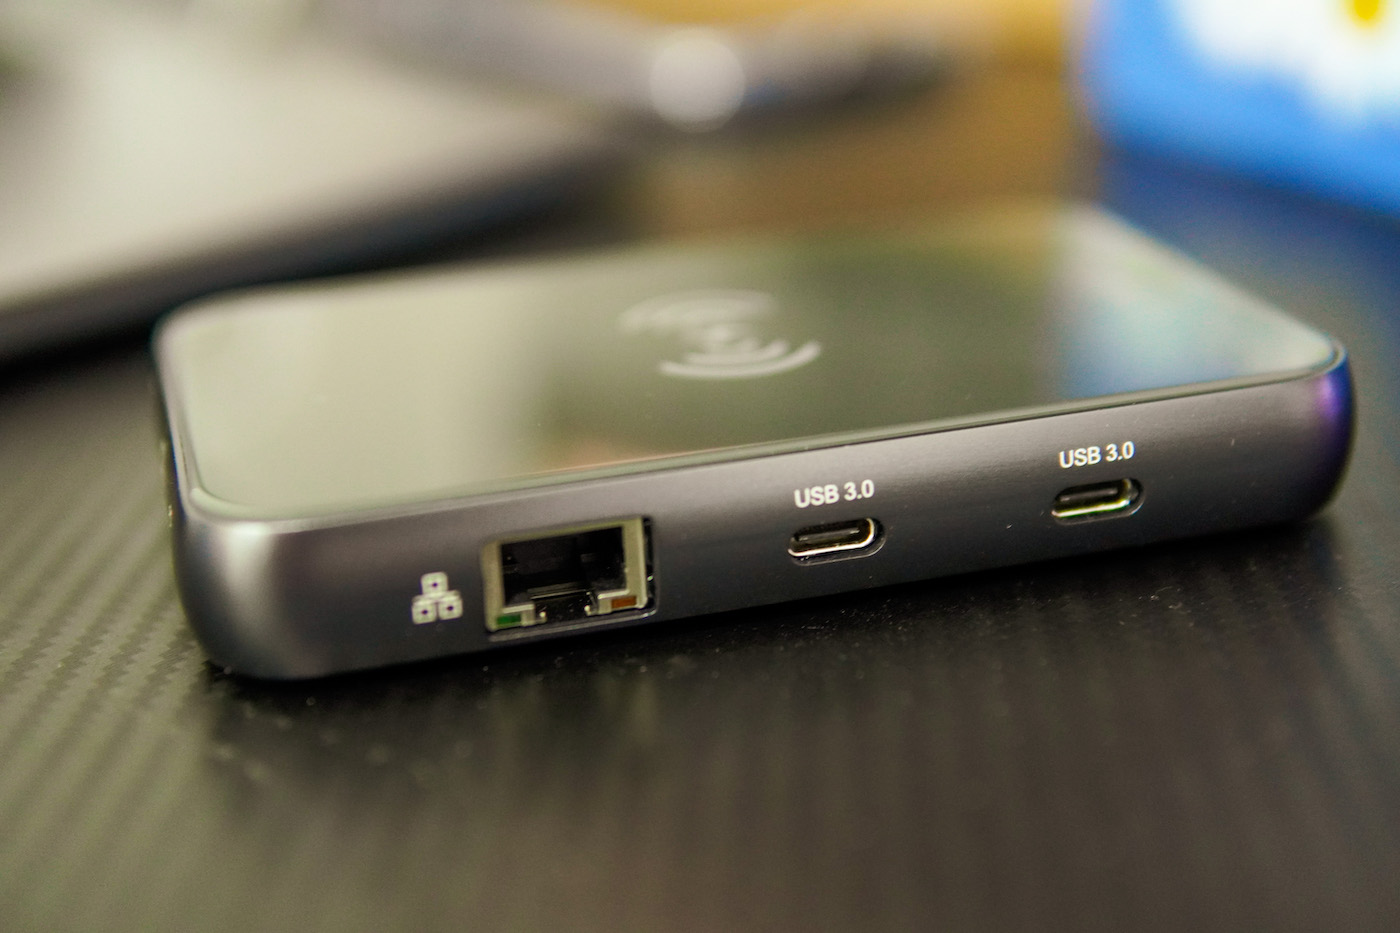 Lauco USB-C 10 in 1 Wireless Charging Hub 2